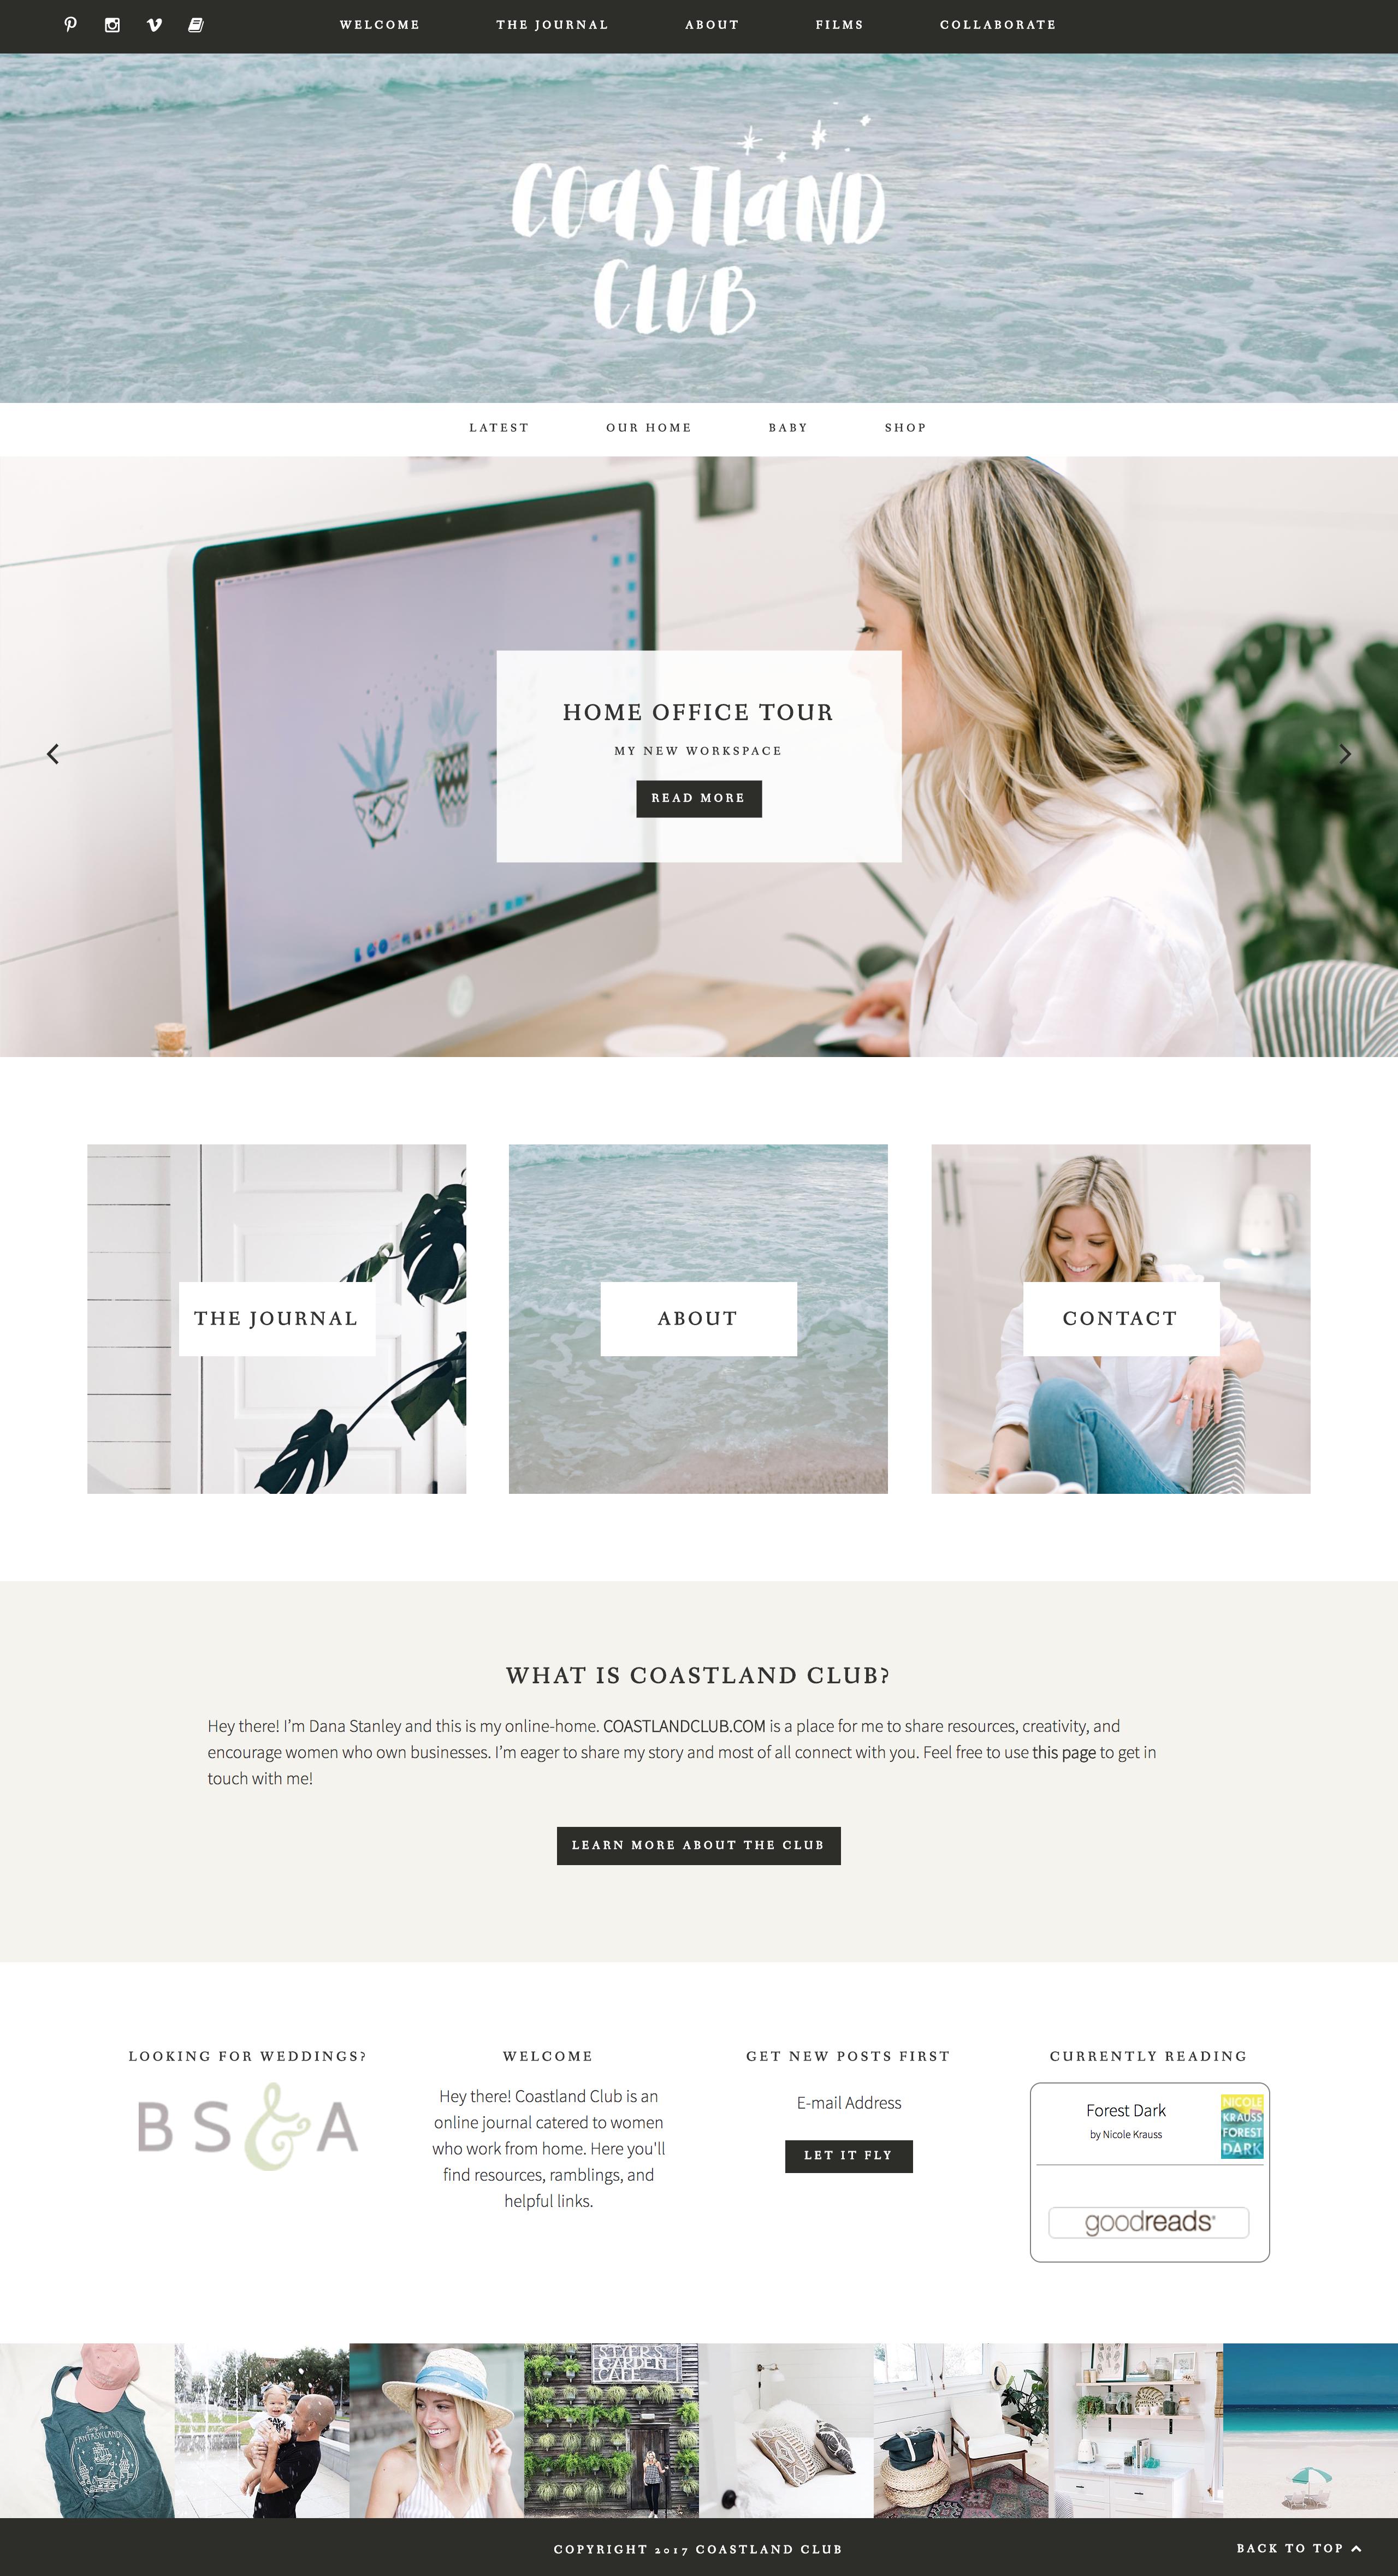 Moneysedosti Knowledge Resources Page Web Design Tips Portfolio Web Design Web Design Services